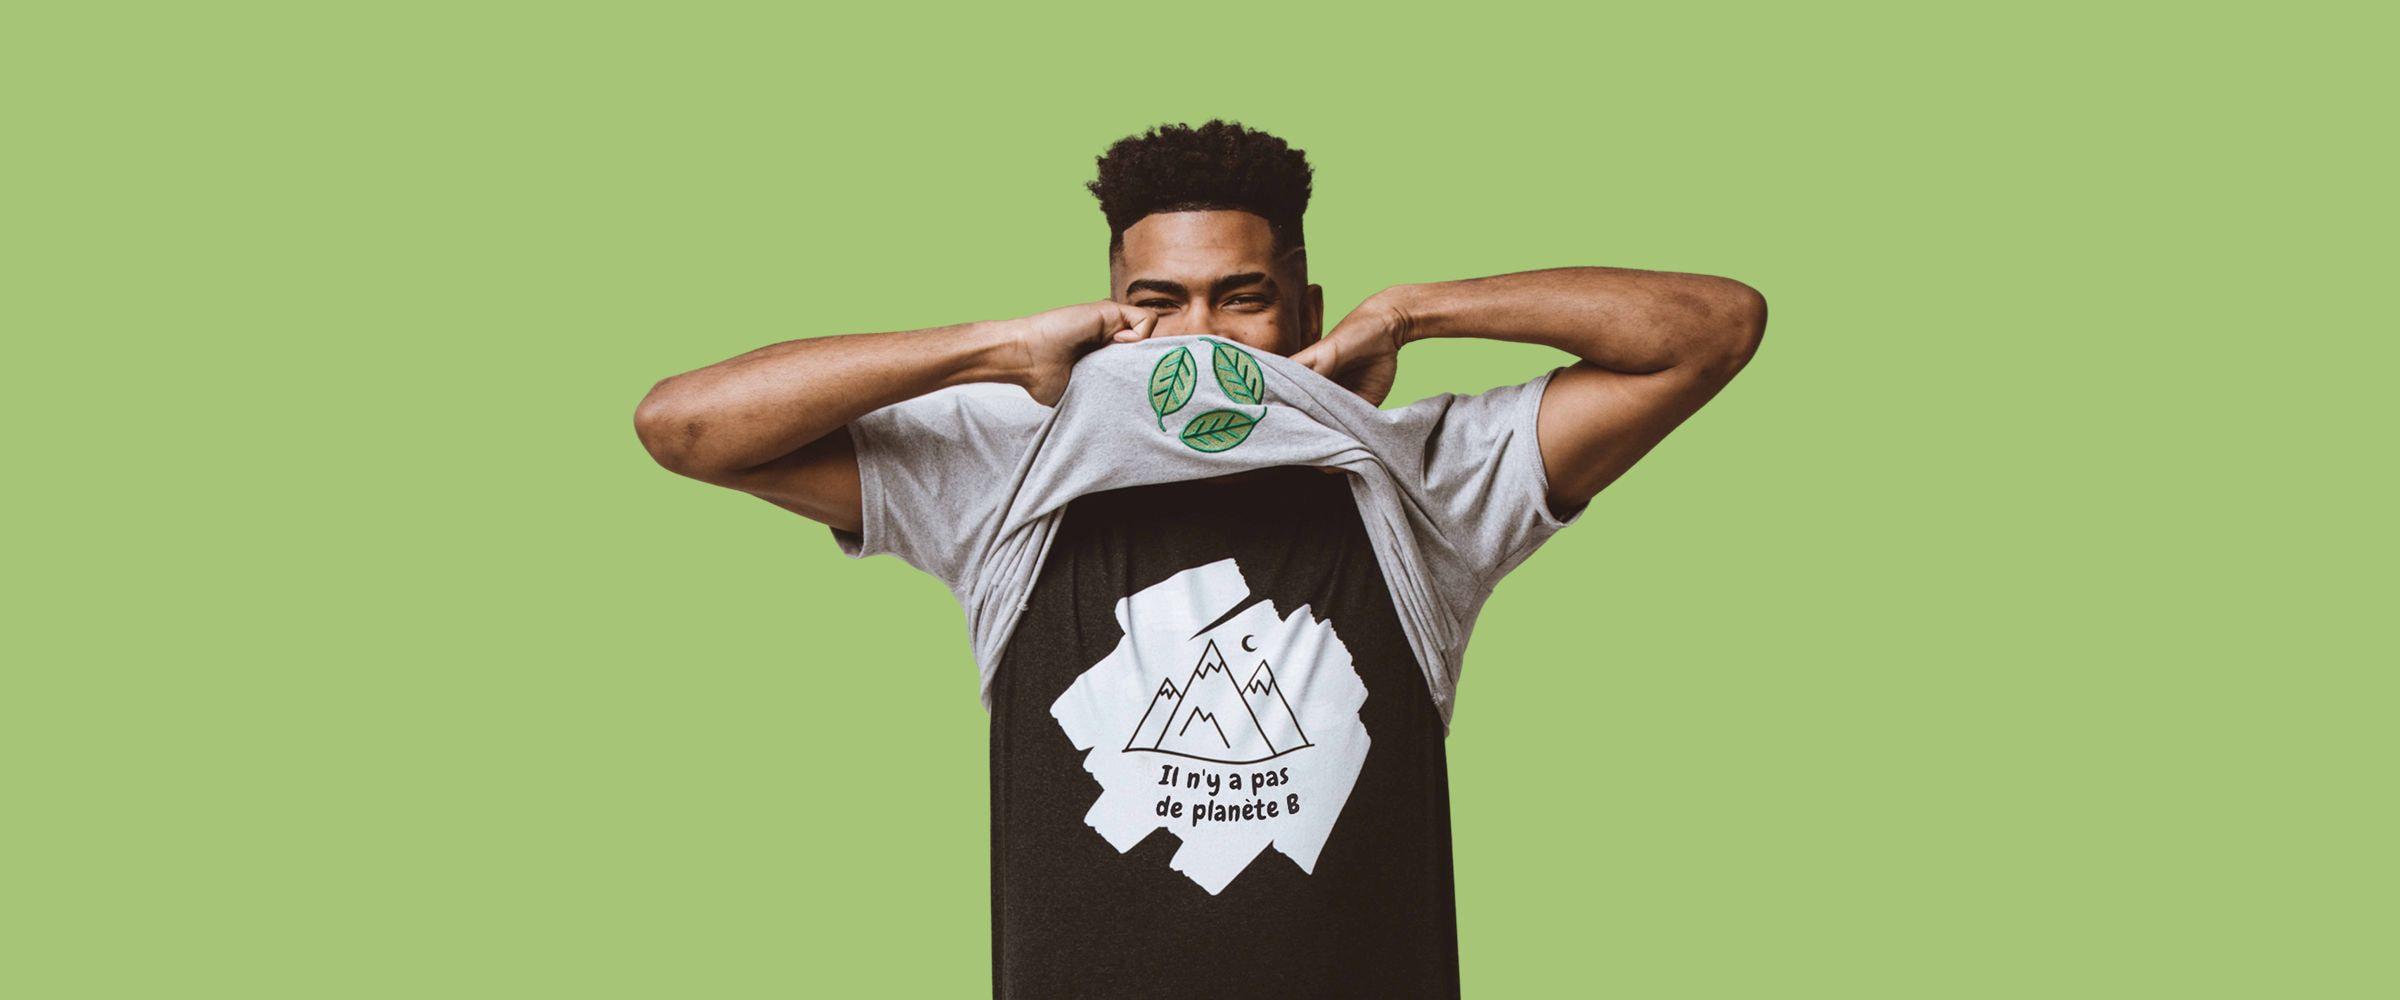 camisetas eco friendly